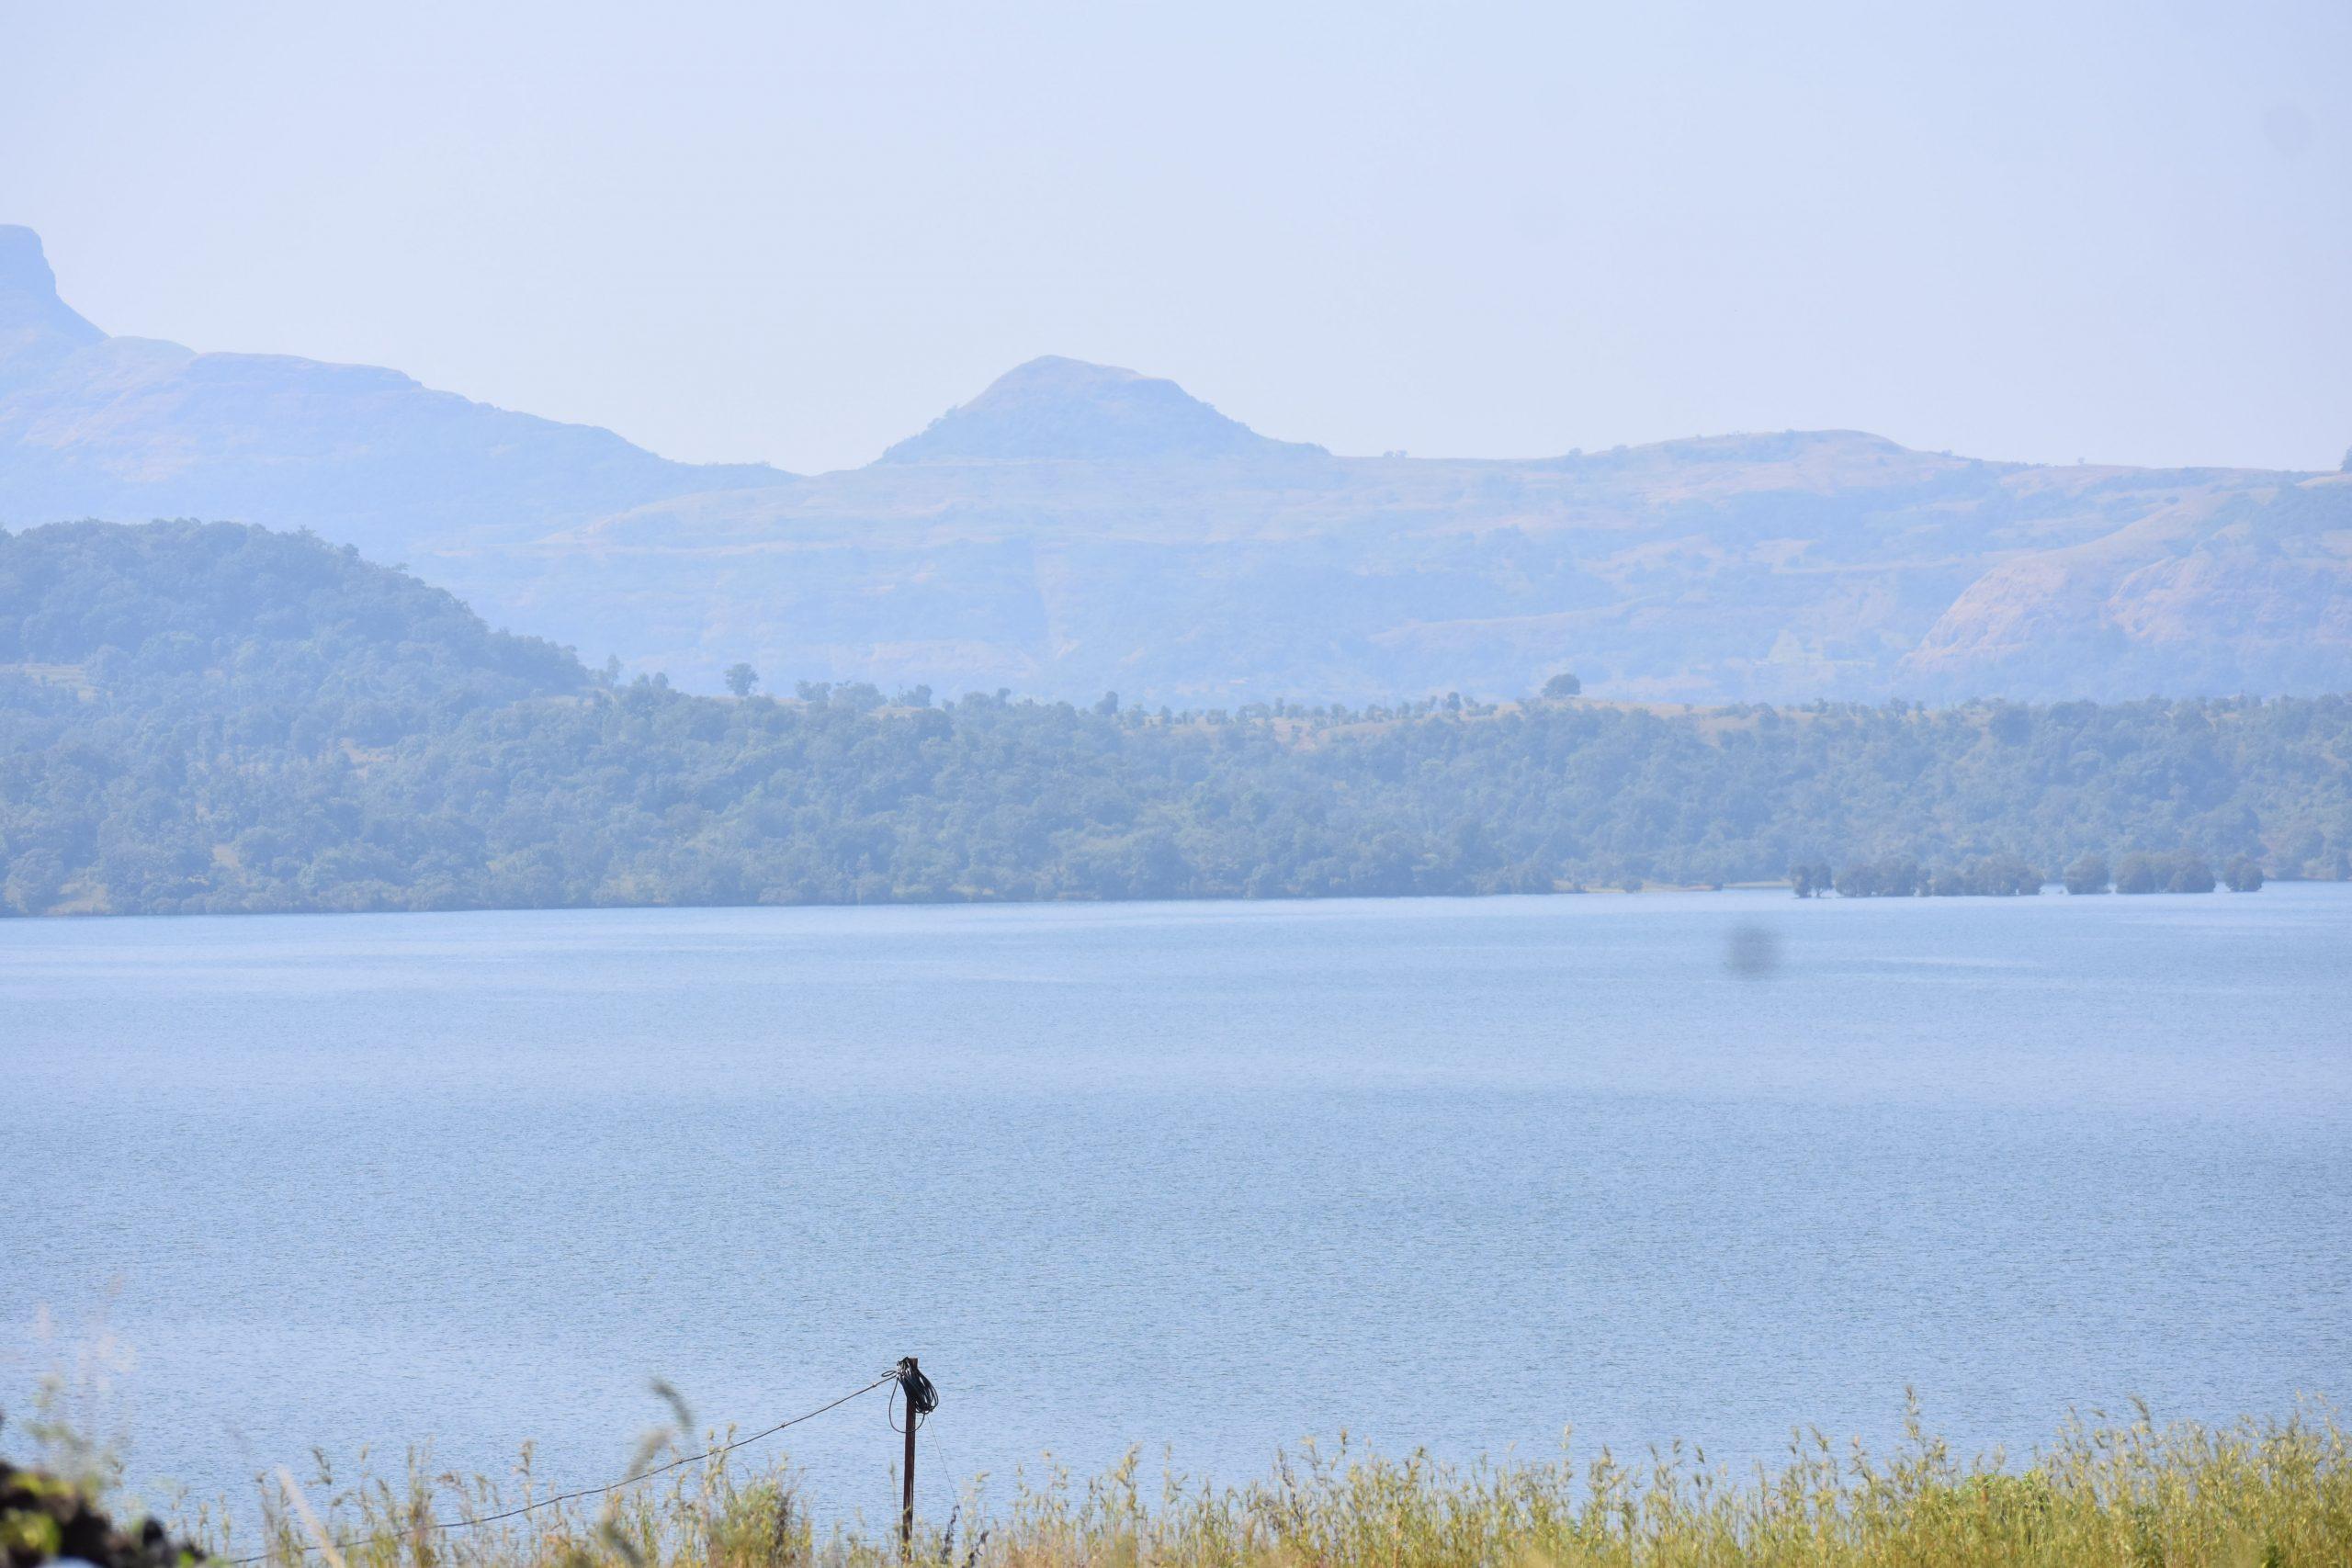 A lake under mountains